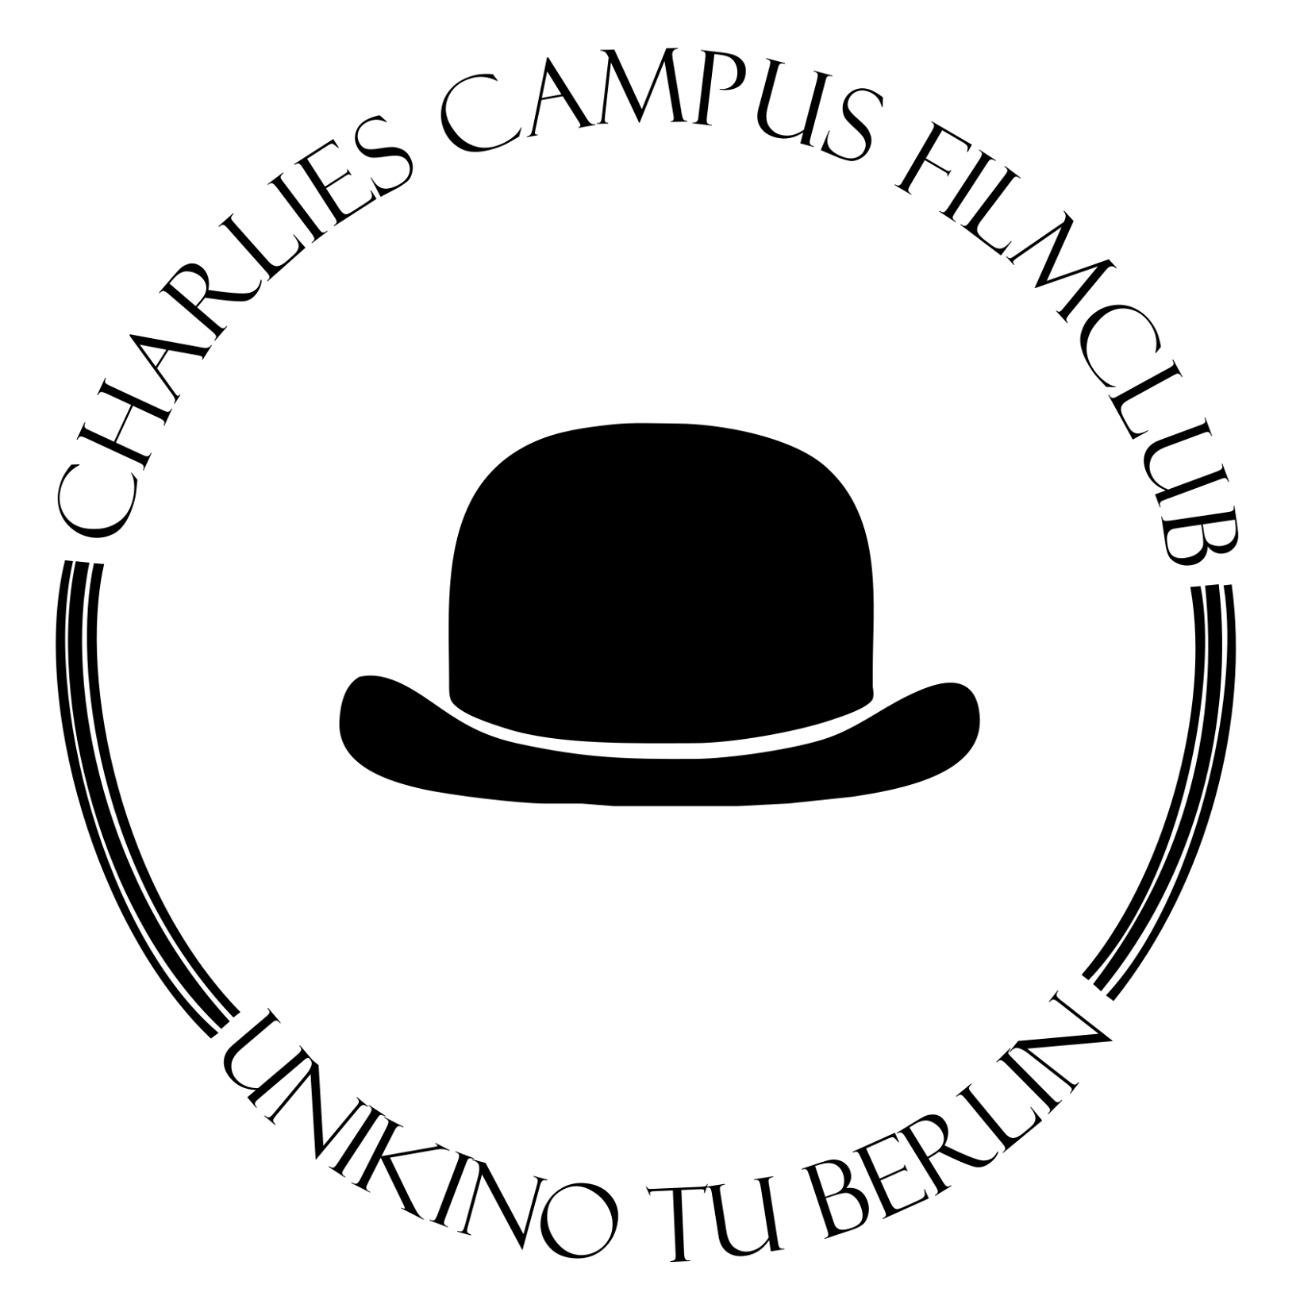 charlies campus filmclub unikino berlin logo